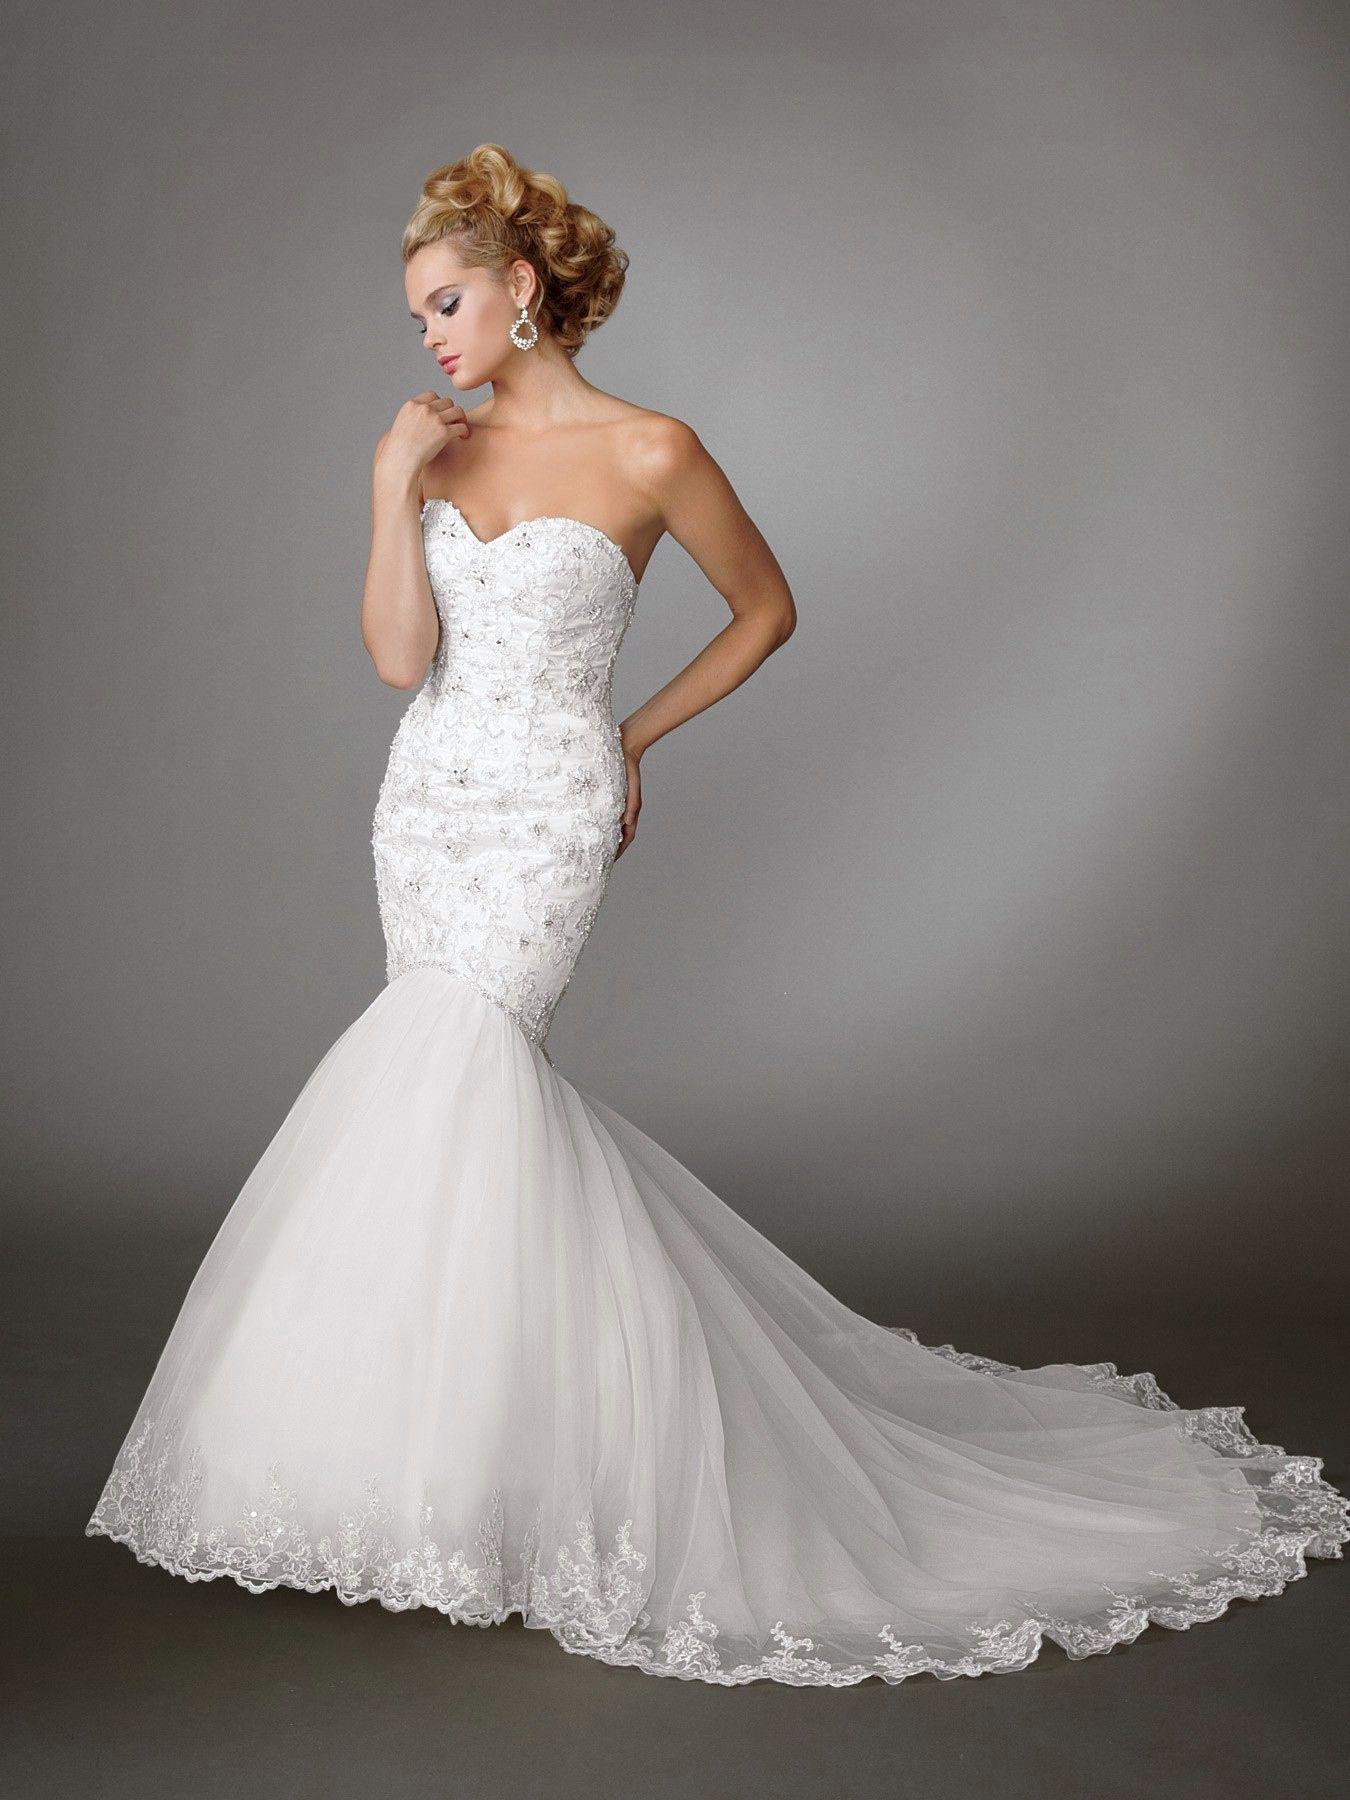 Cheap Wedding Dresses atlanta Ga - Cute Dresses for A Wedding ...